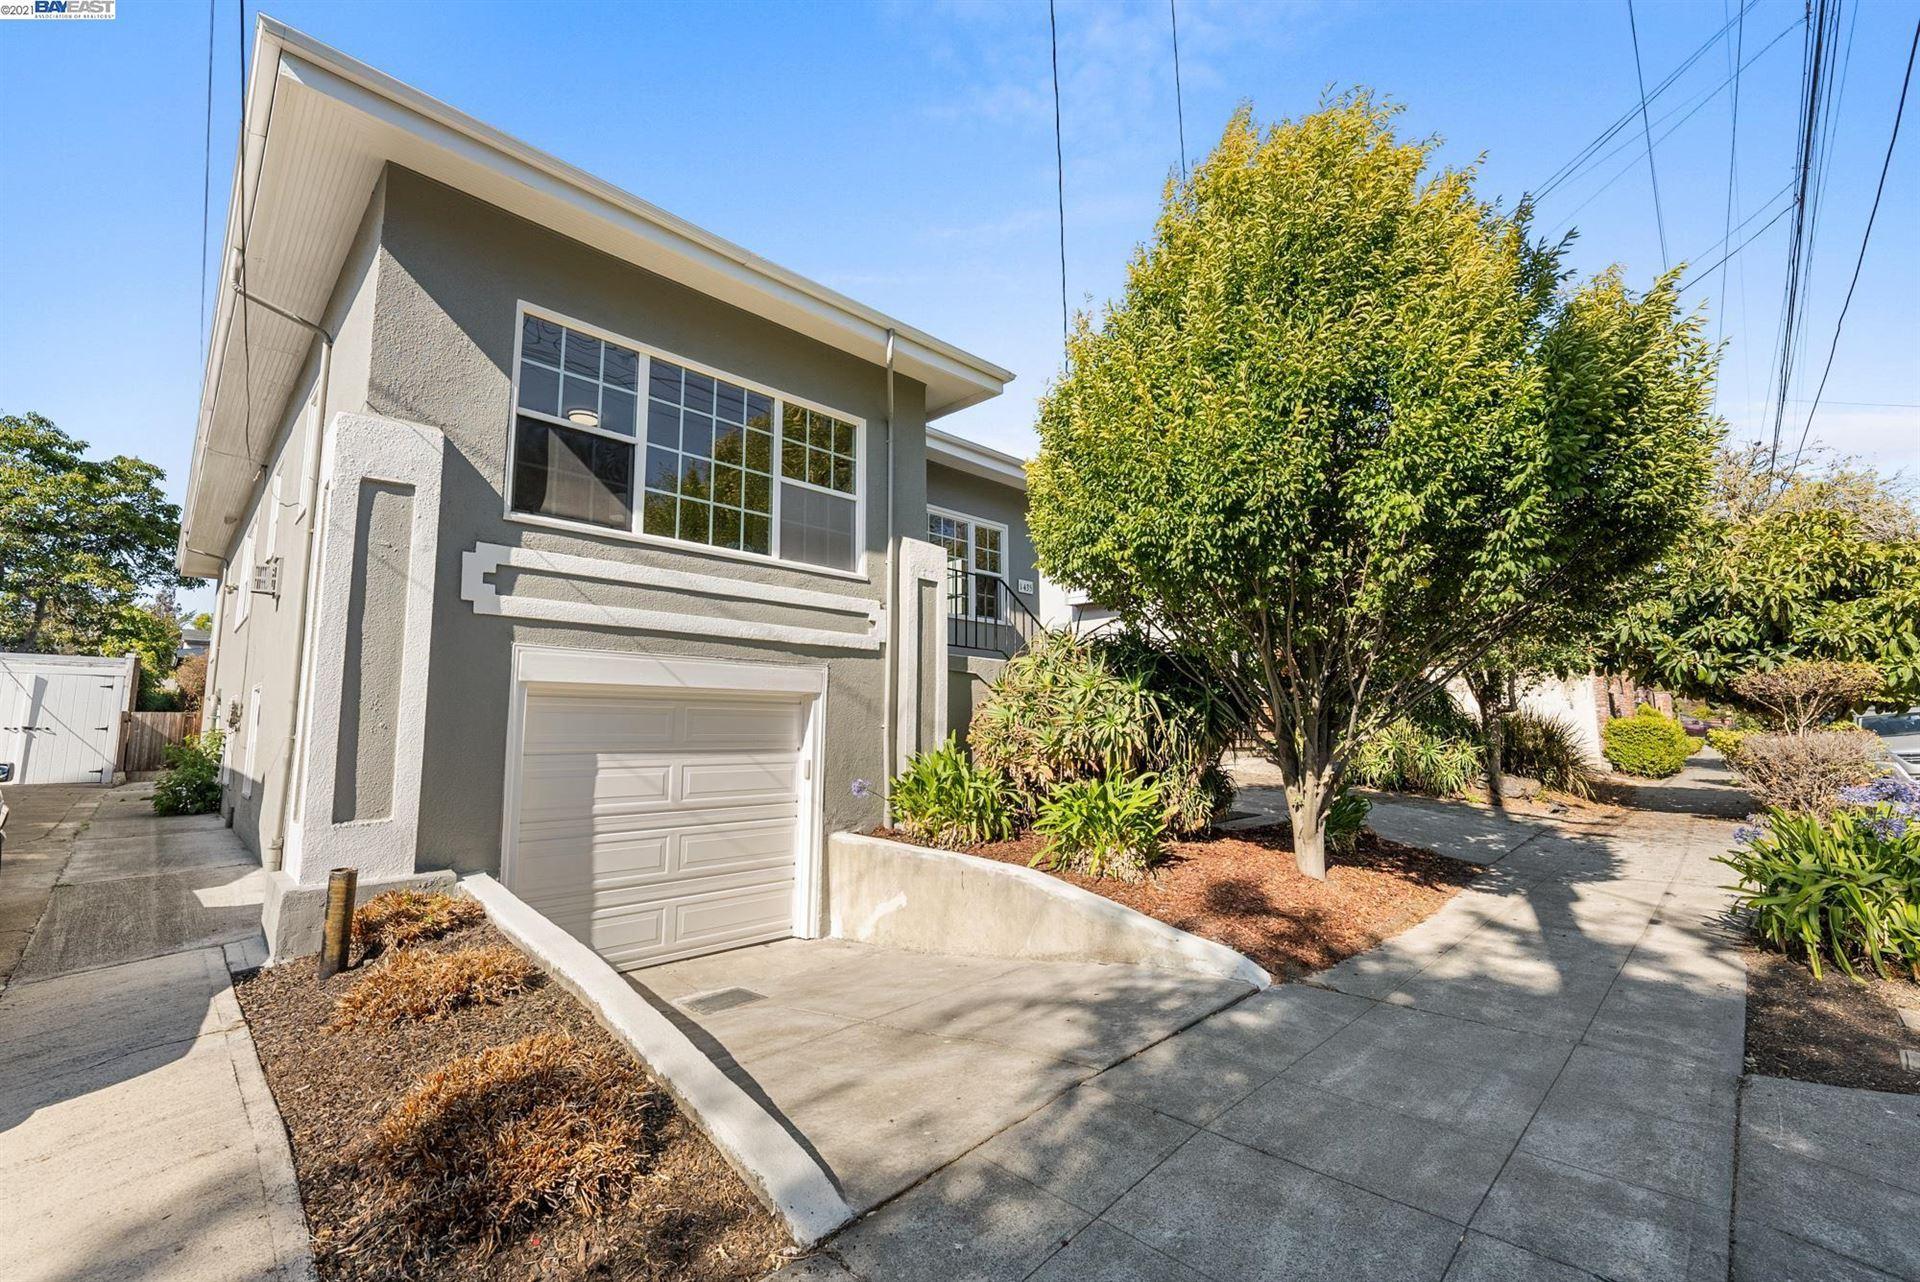 Photo of 1435 Parker St, BERKELEY, CA 94702 (MLS # 40967398)